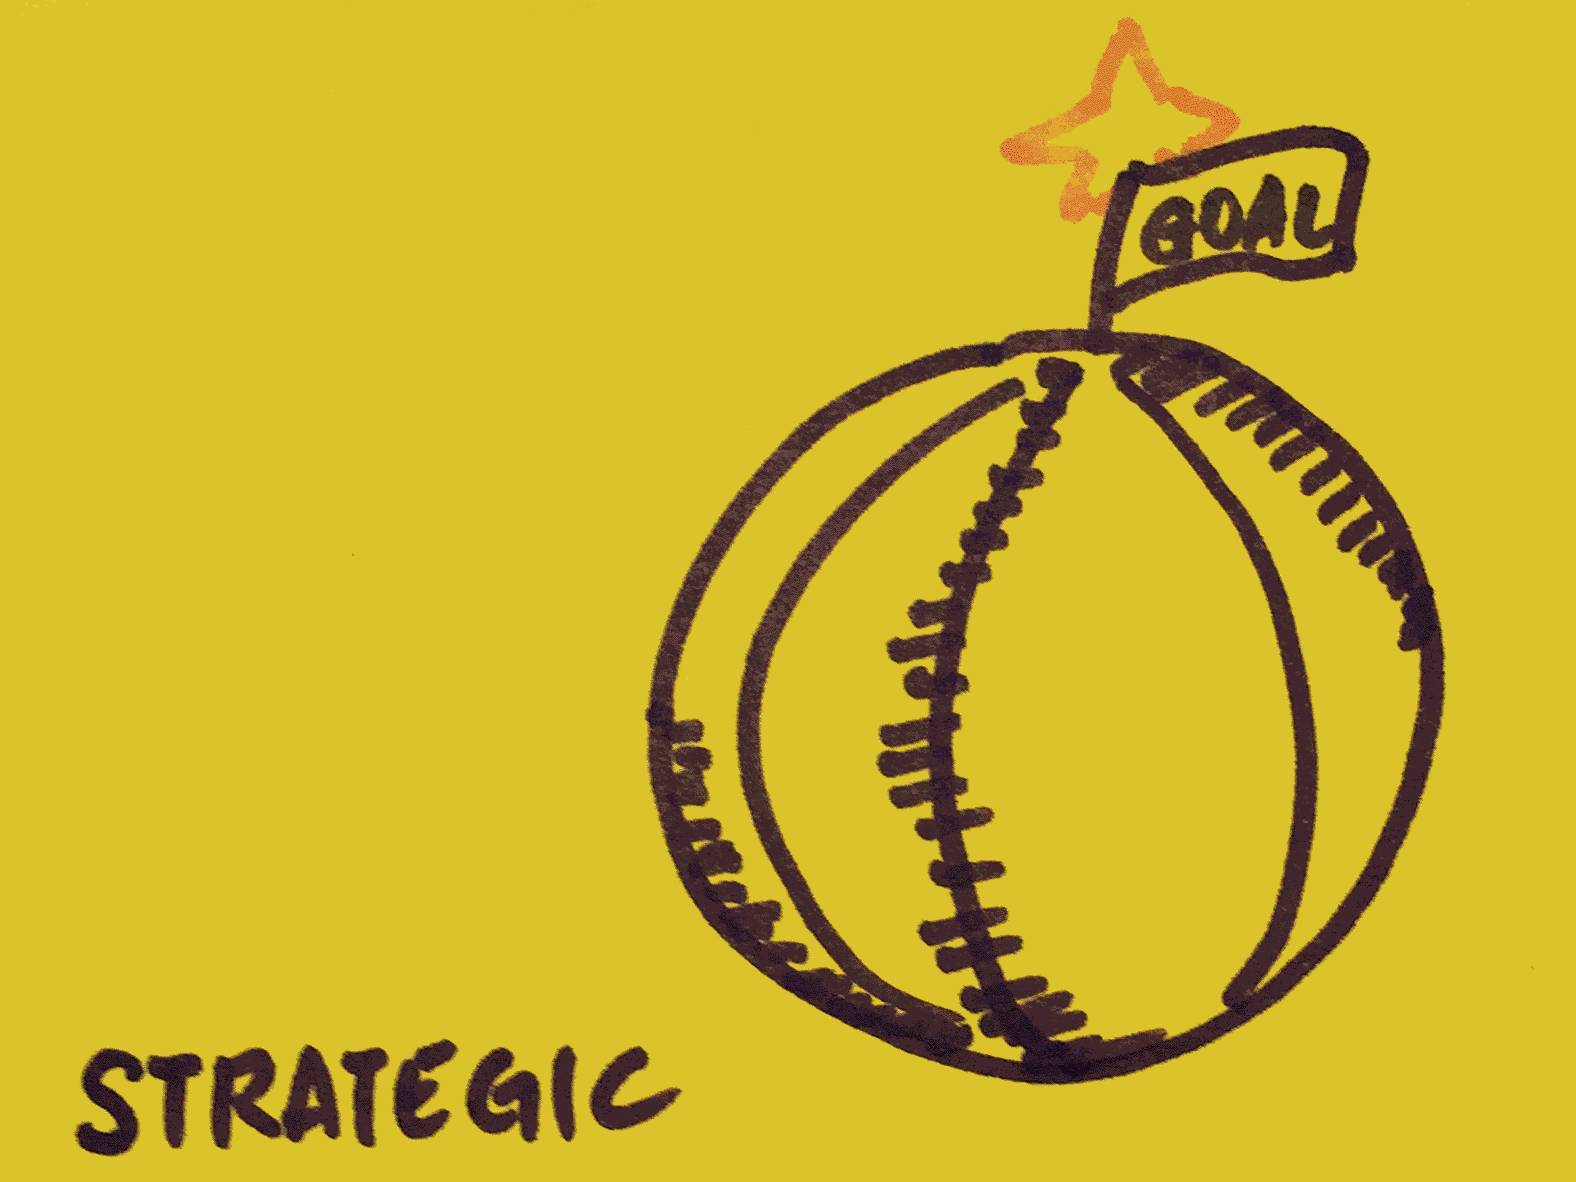 Strategic Strengthsfinder Ball of Goal